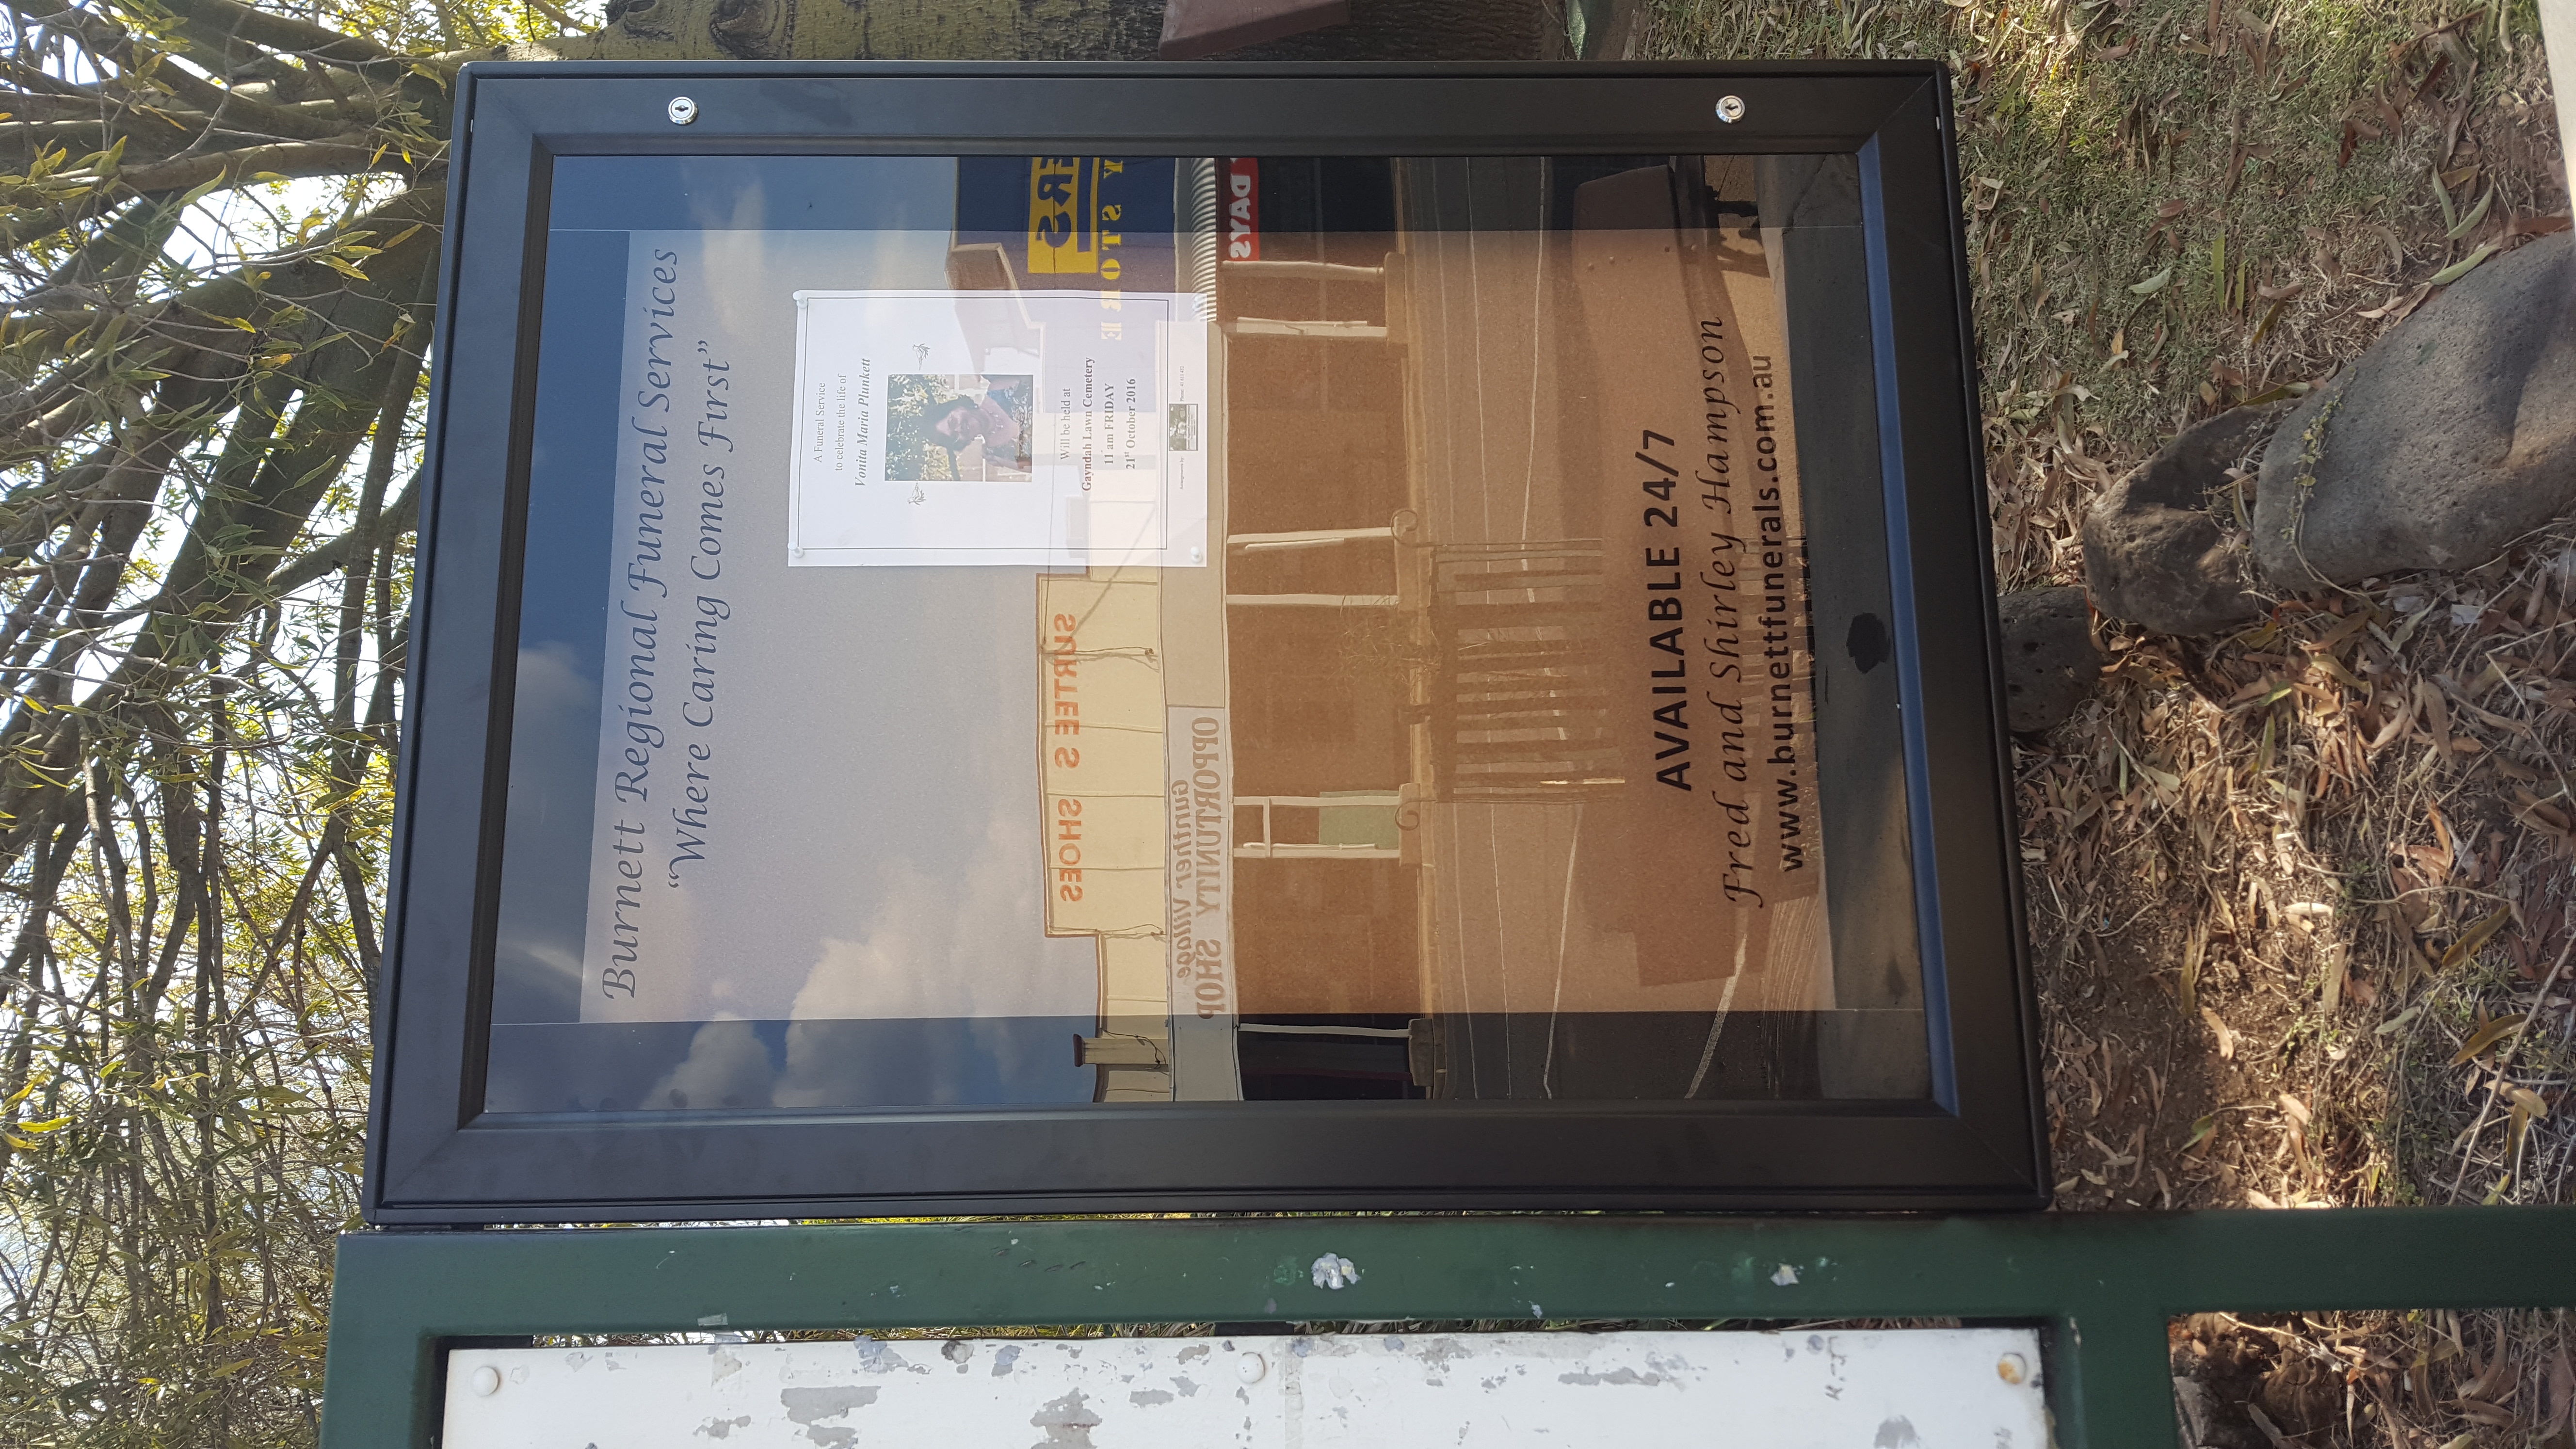 BRFS noticeboard - after (1)